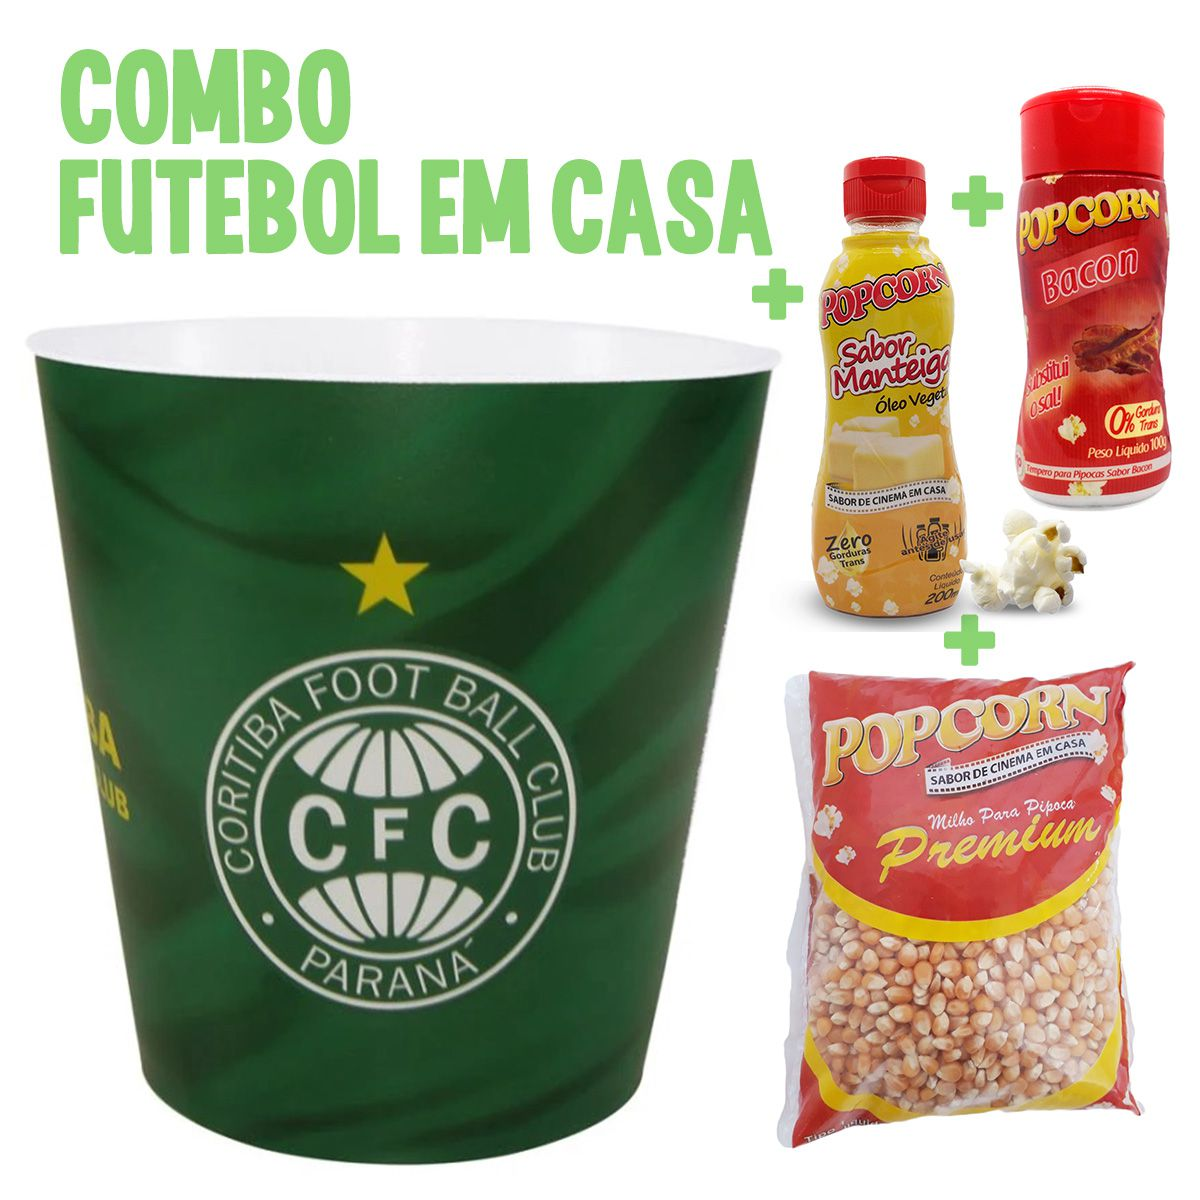 Combo Futebol em Casa + Balde do Coritiba.